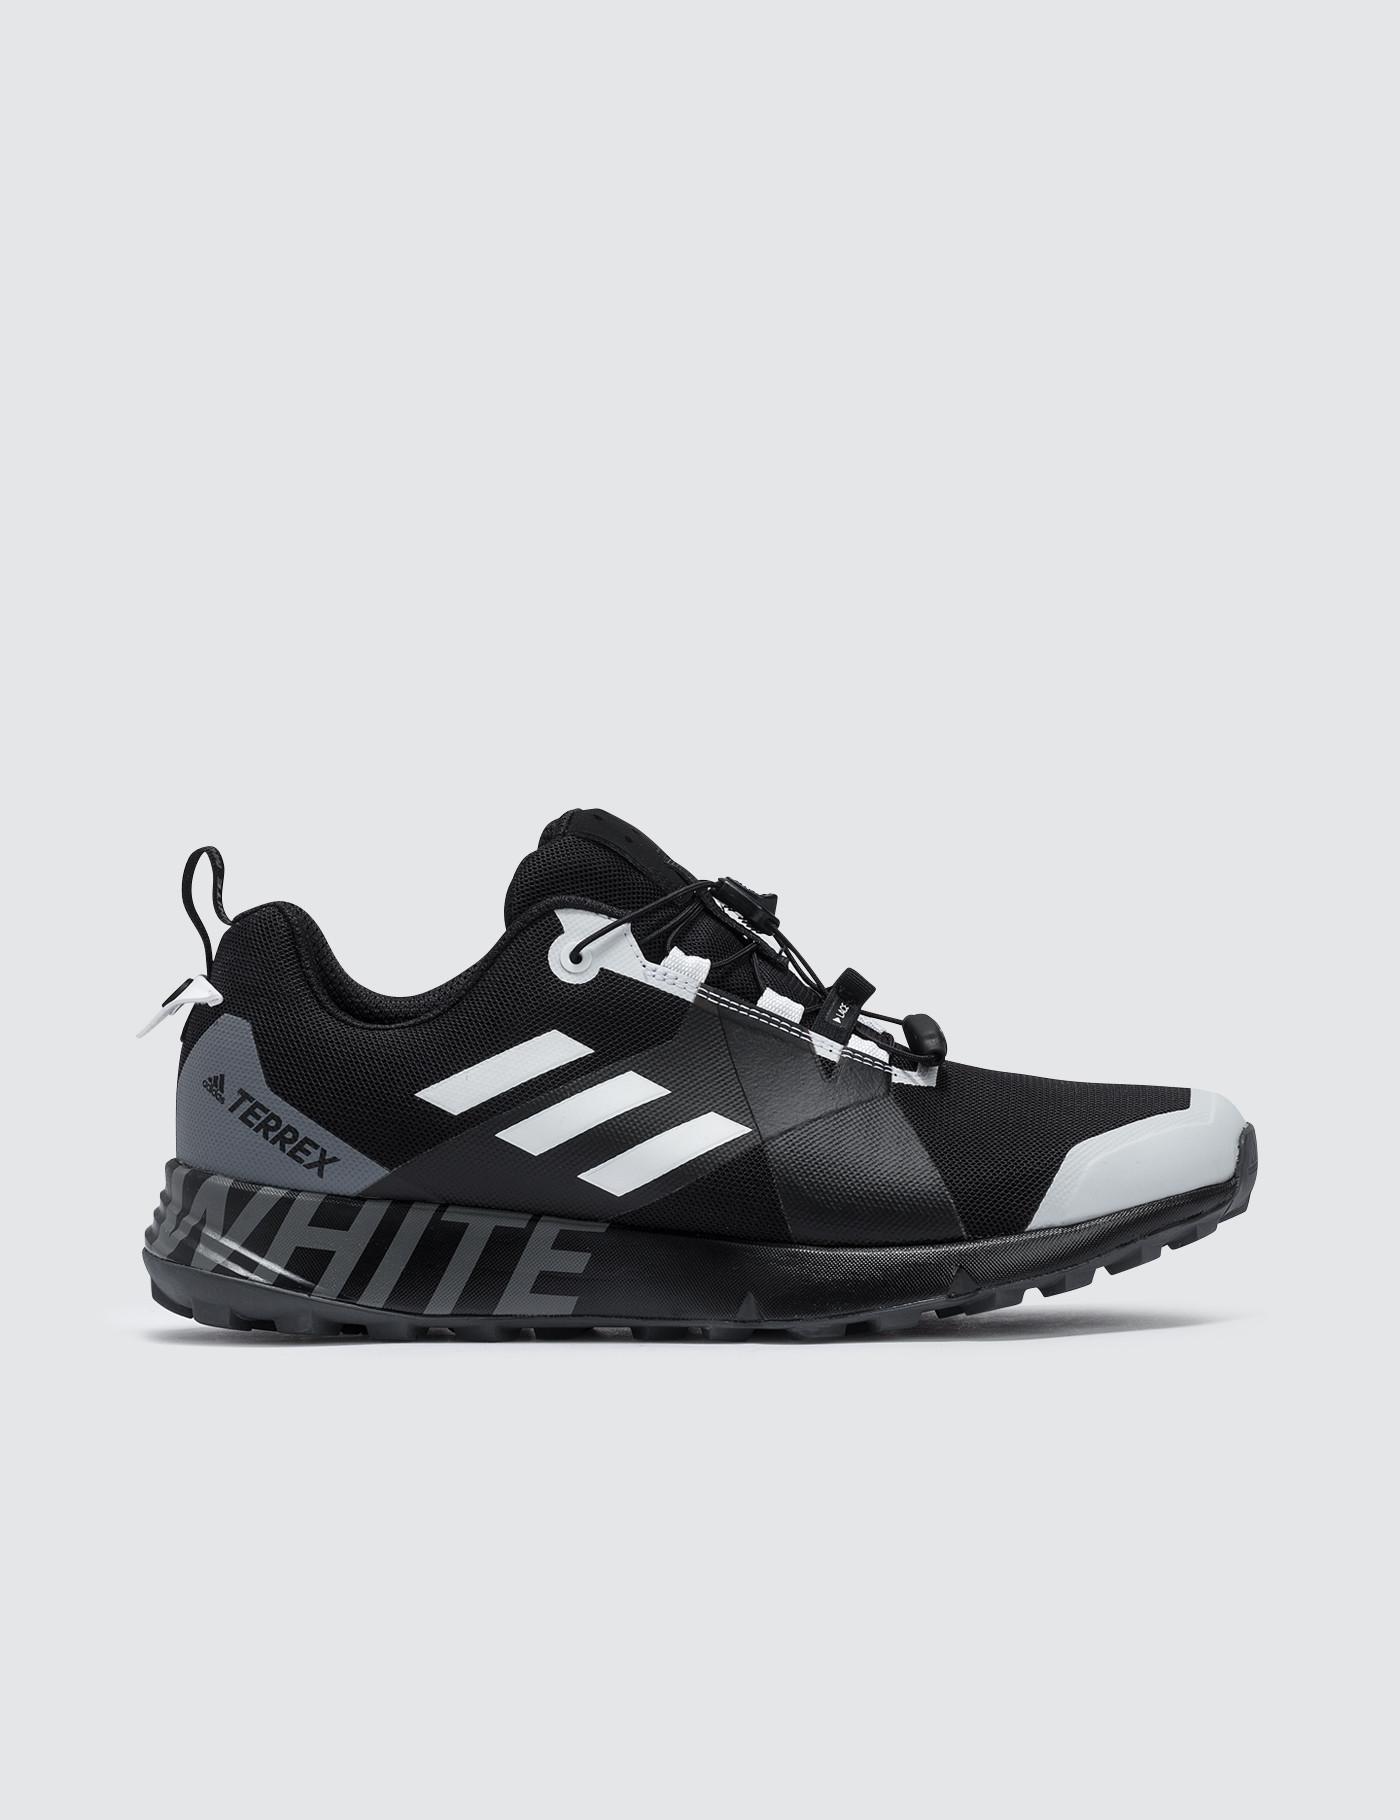 0796efdeafc3 adidas Originals. Men s Black White Mountaineering X Adidas Terrex ...